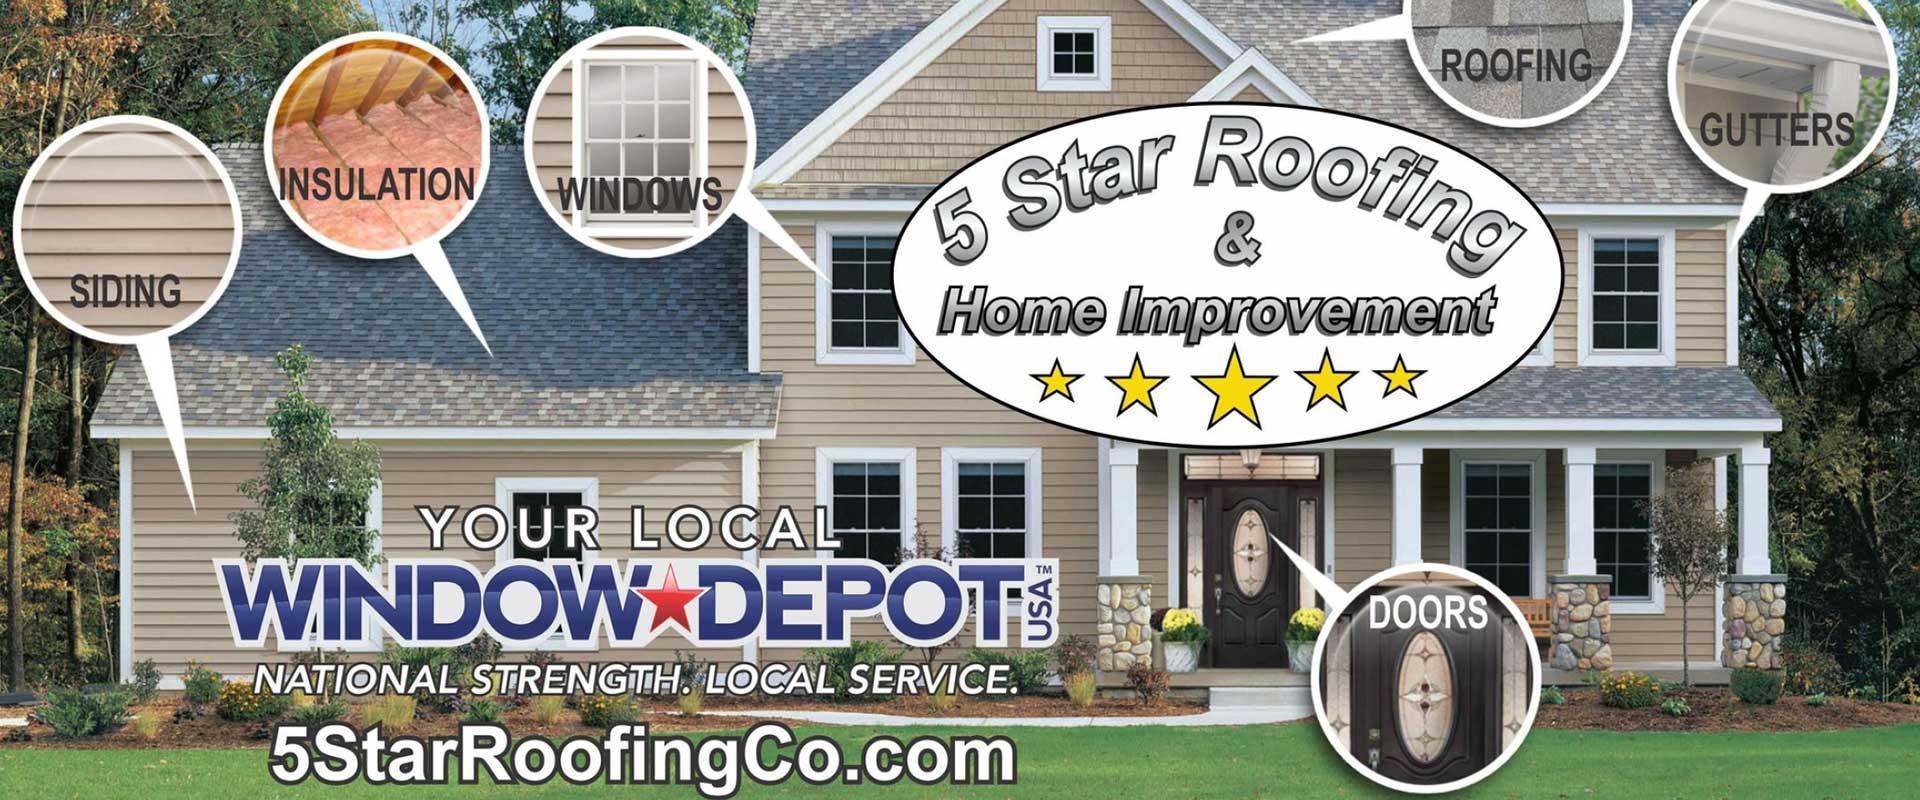 Roofing Windows Siding Seamless Gutters Dumpster